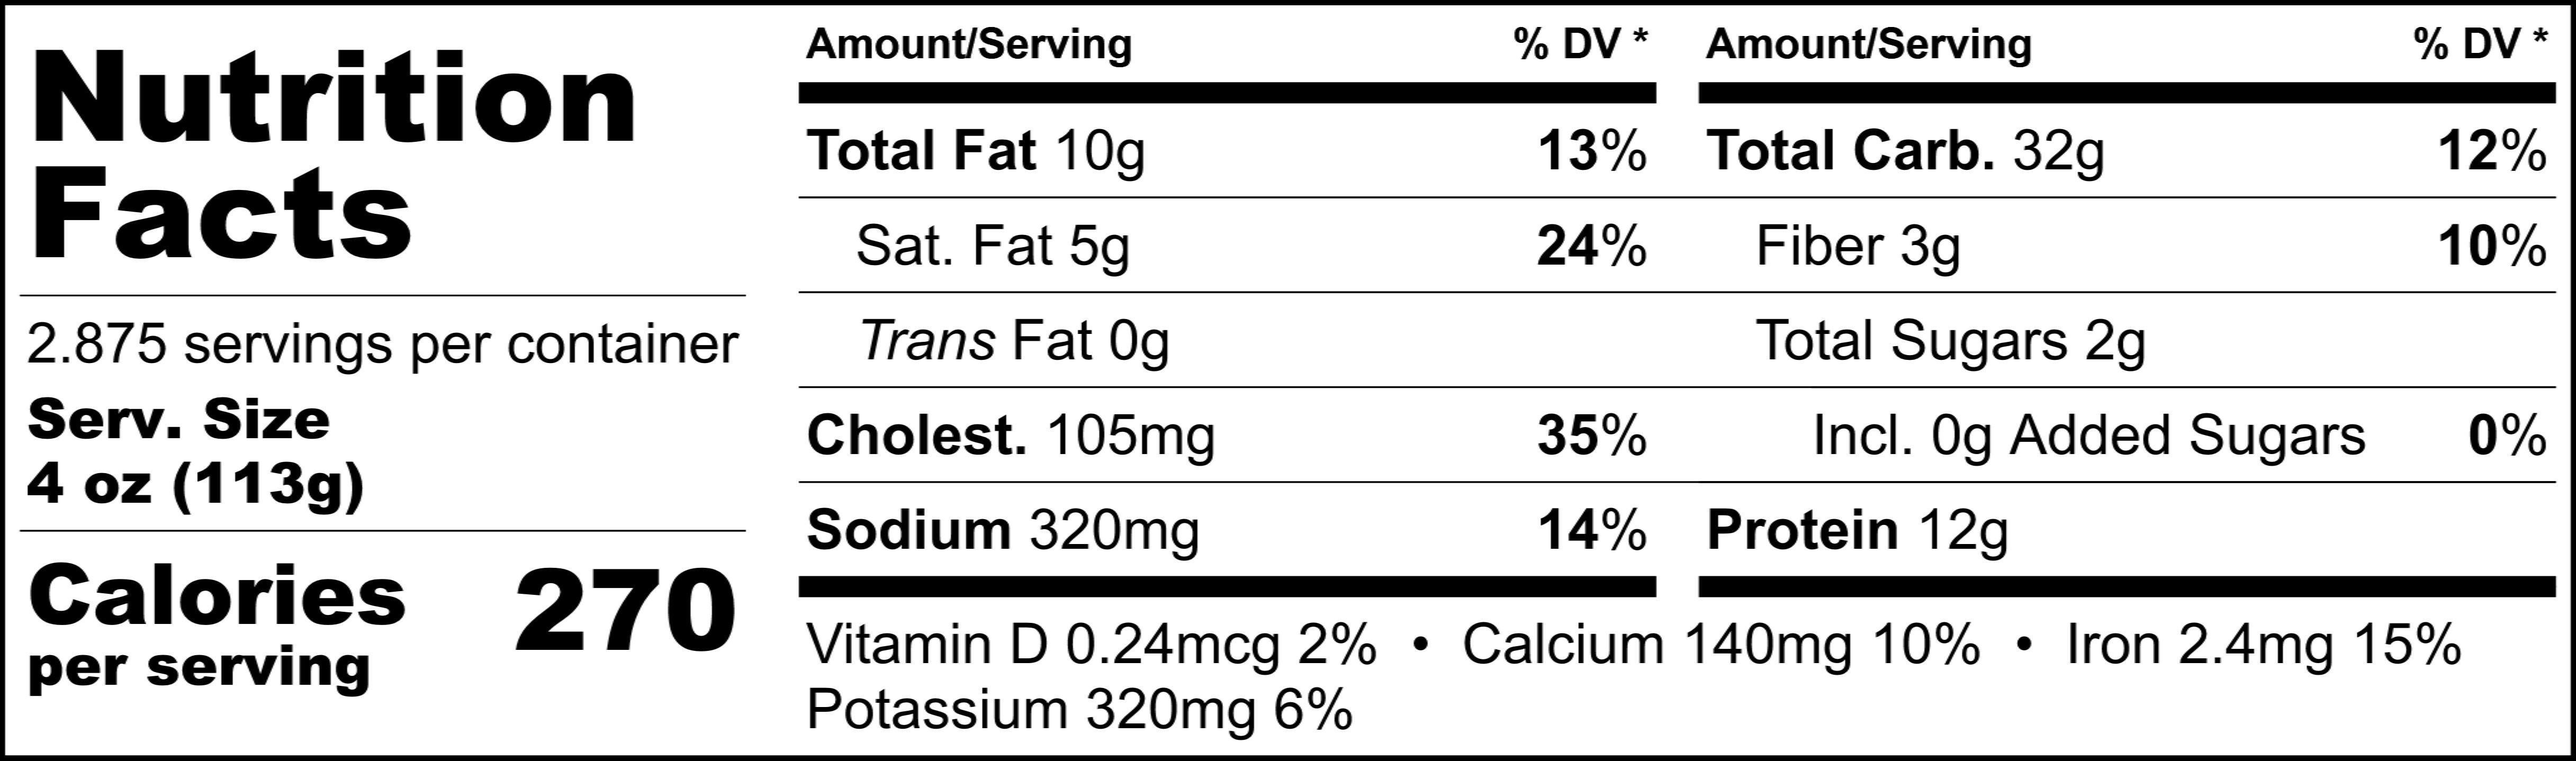 Chili_Relleno_Ravioli_RecipeFormula_Nutrition_Label.jpg